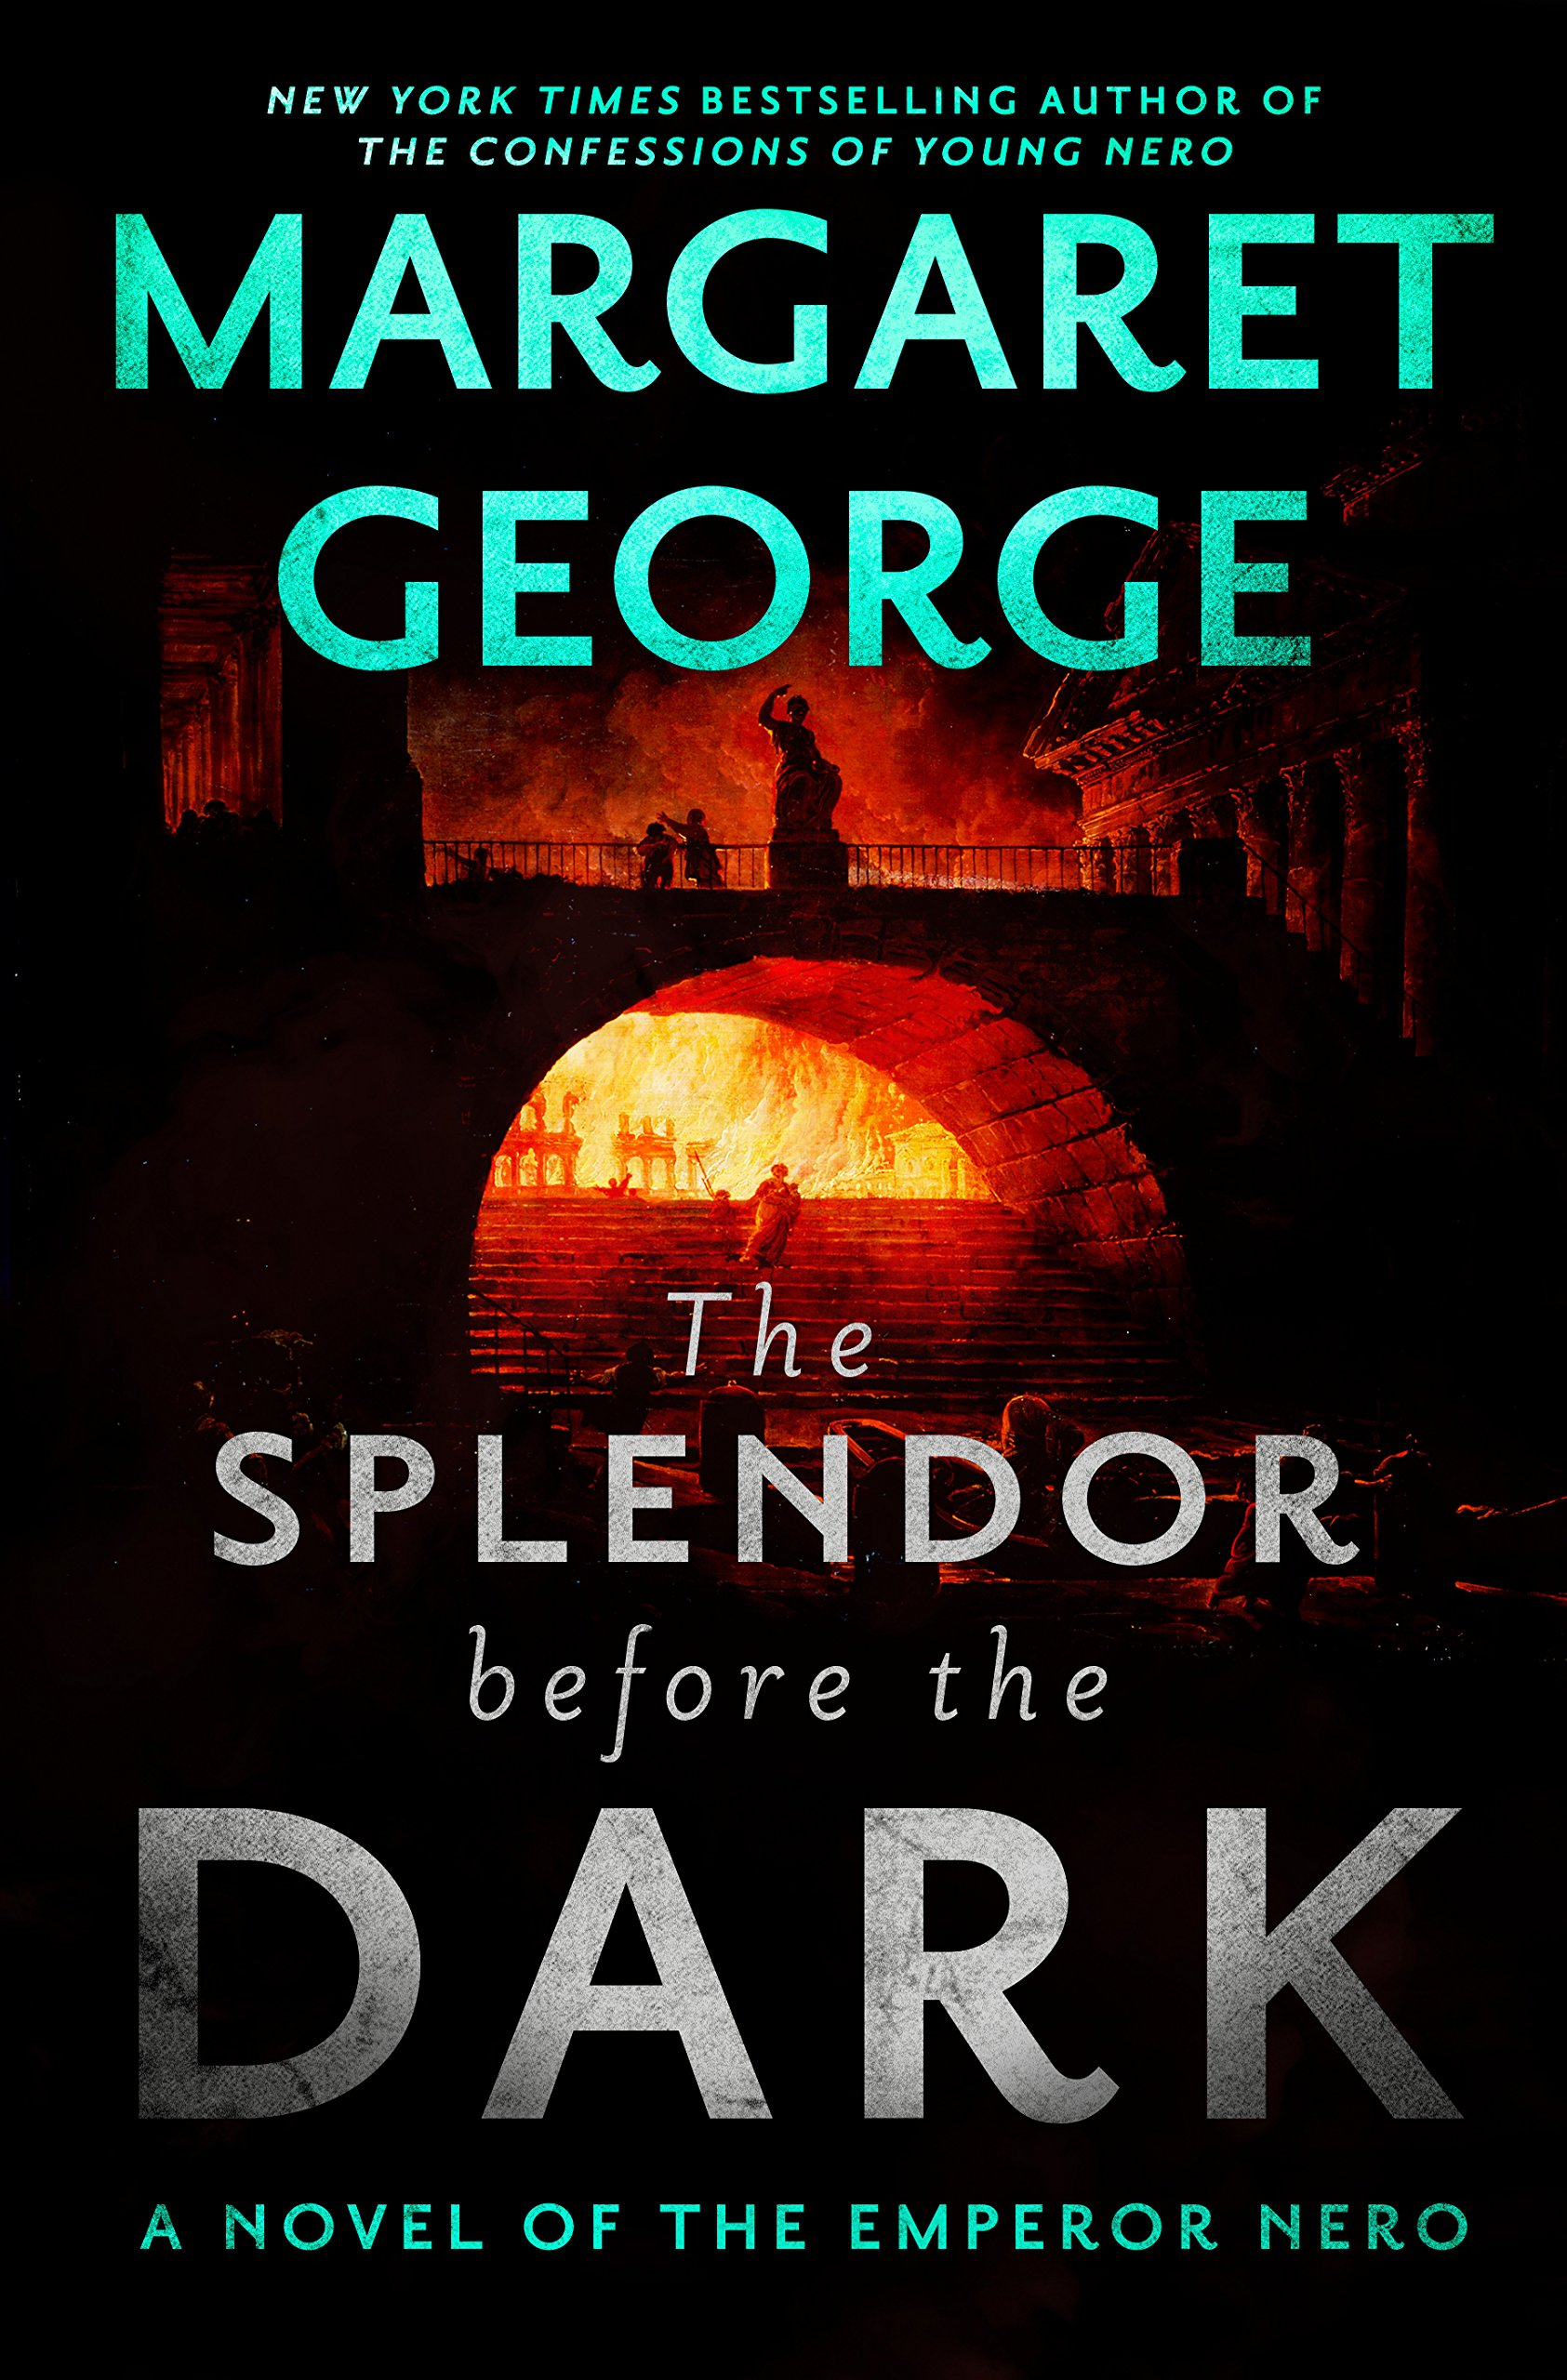 THE SPLENDOR BEFORE DARK by Margaret George